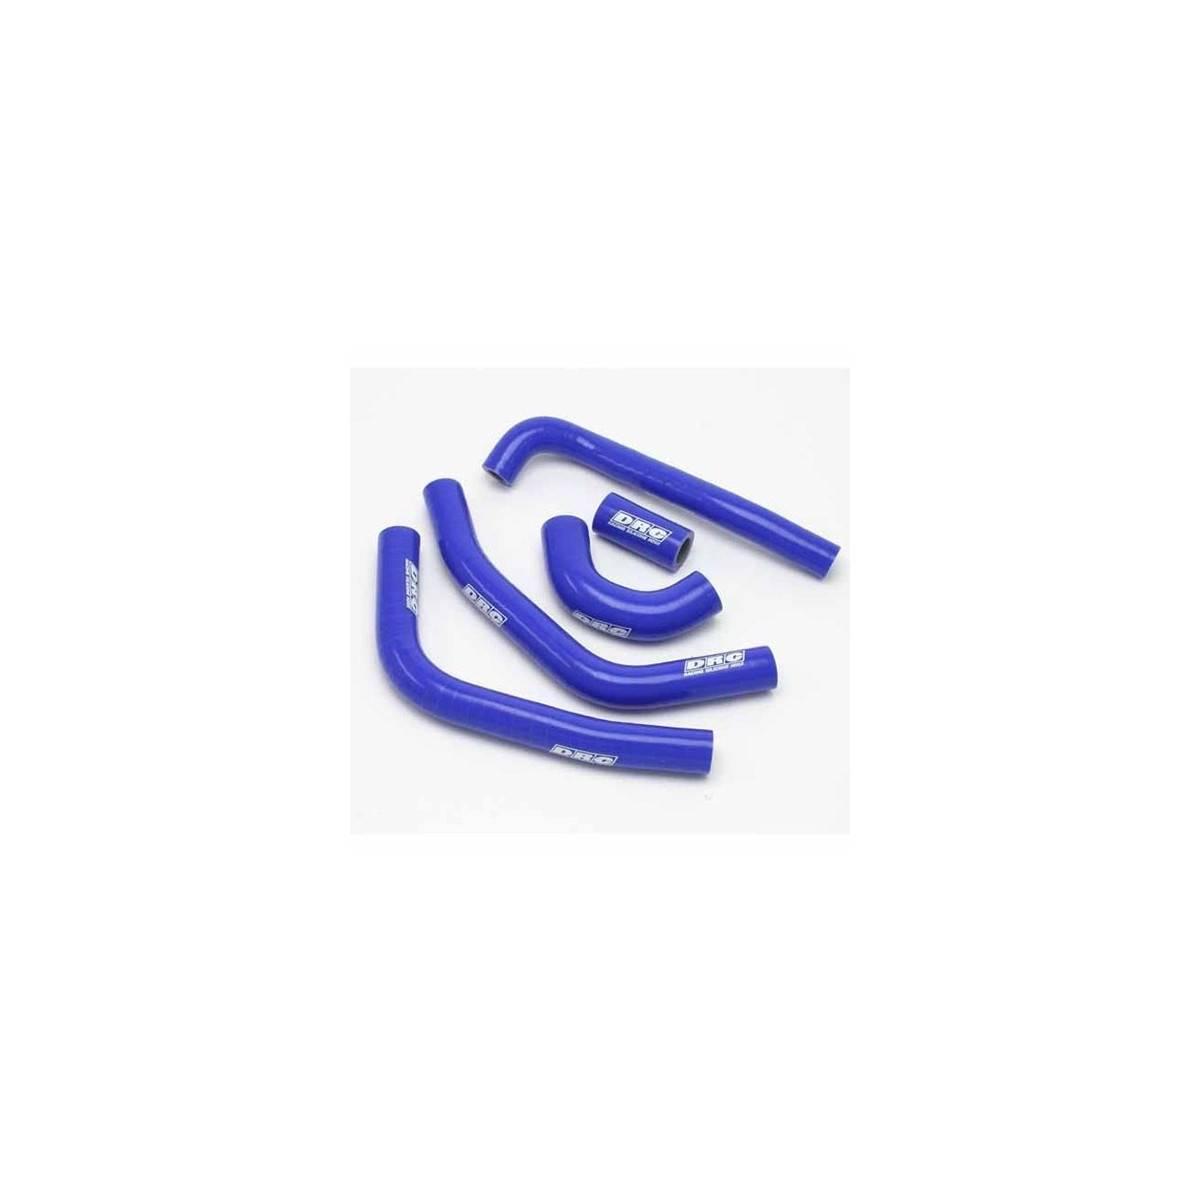 D47.01.812 - Kit Manguitos Husqvarna Tc85 ´14 Azul